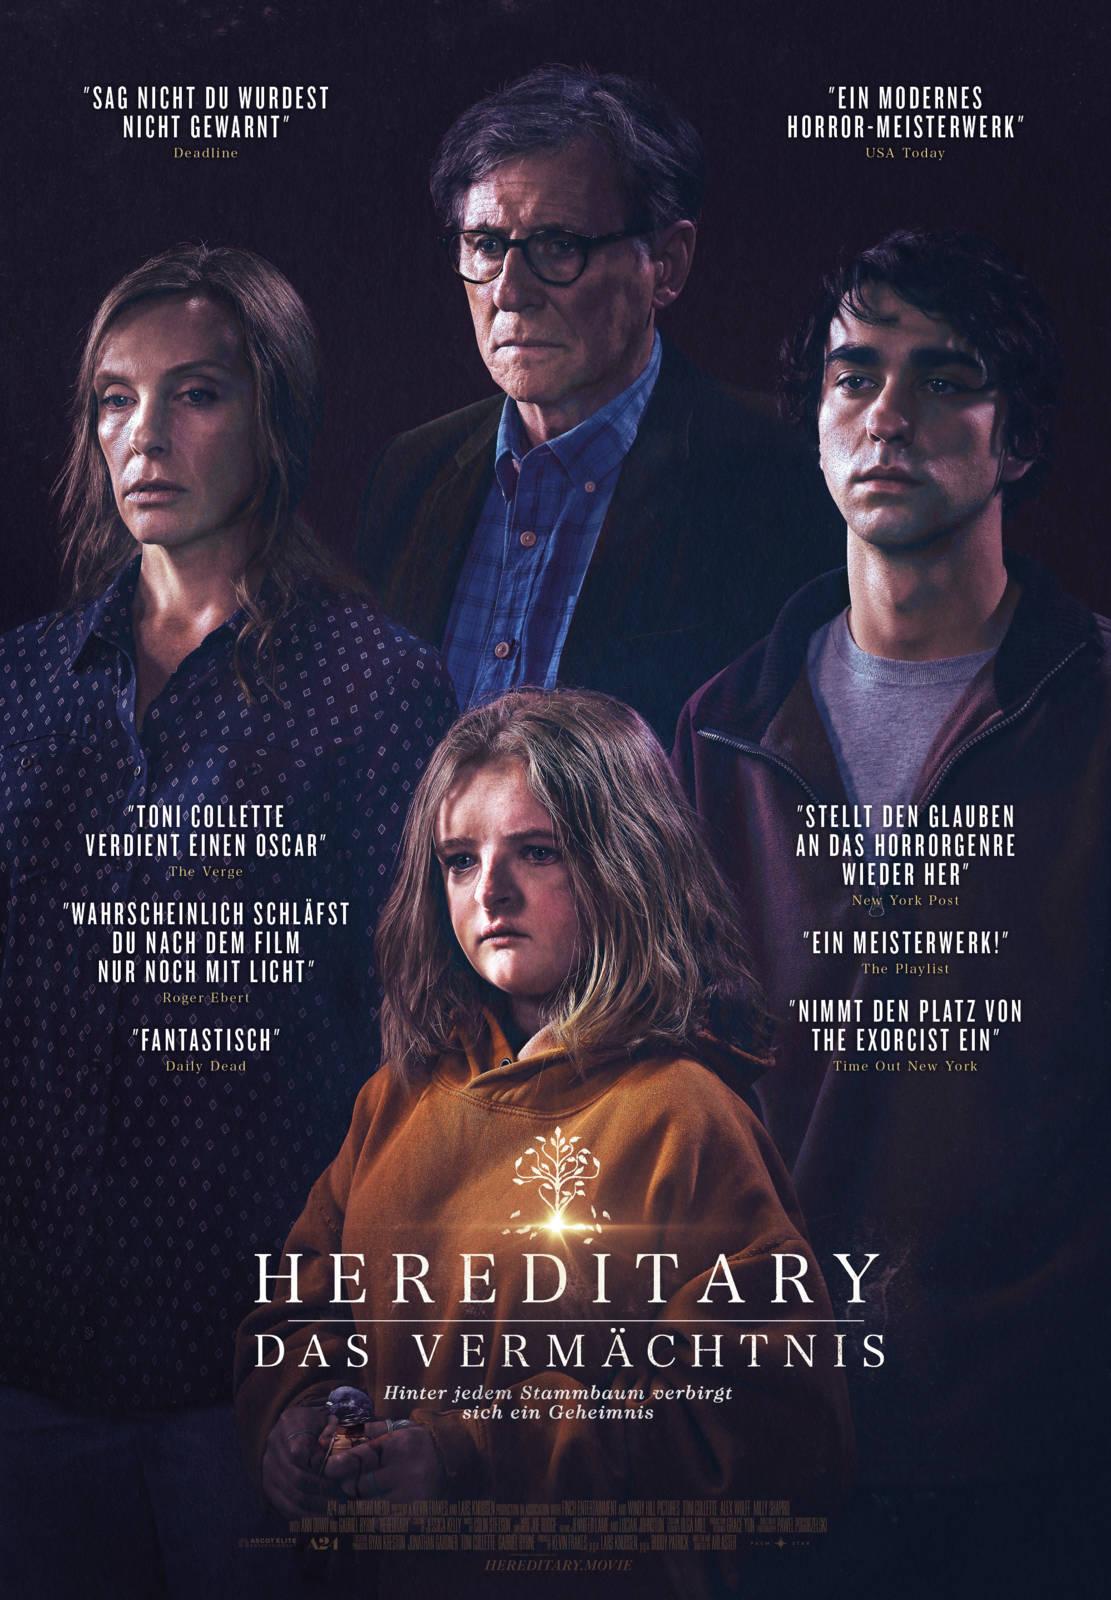 RottenPop Reviews: Hereditary (2018) - Ari Aster — Rotten Pop